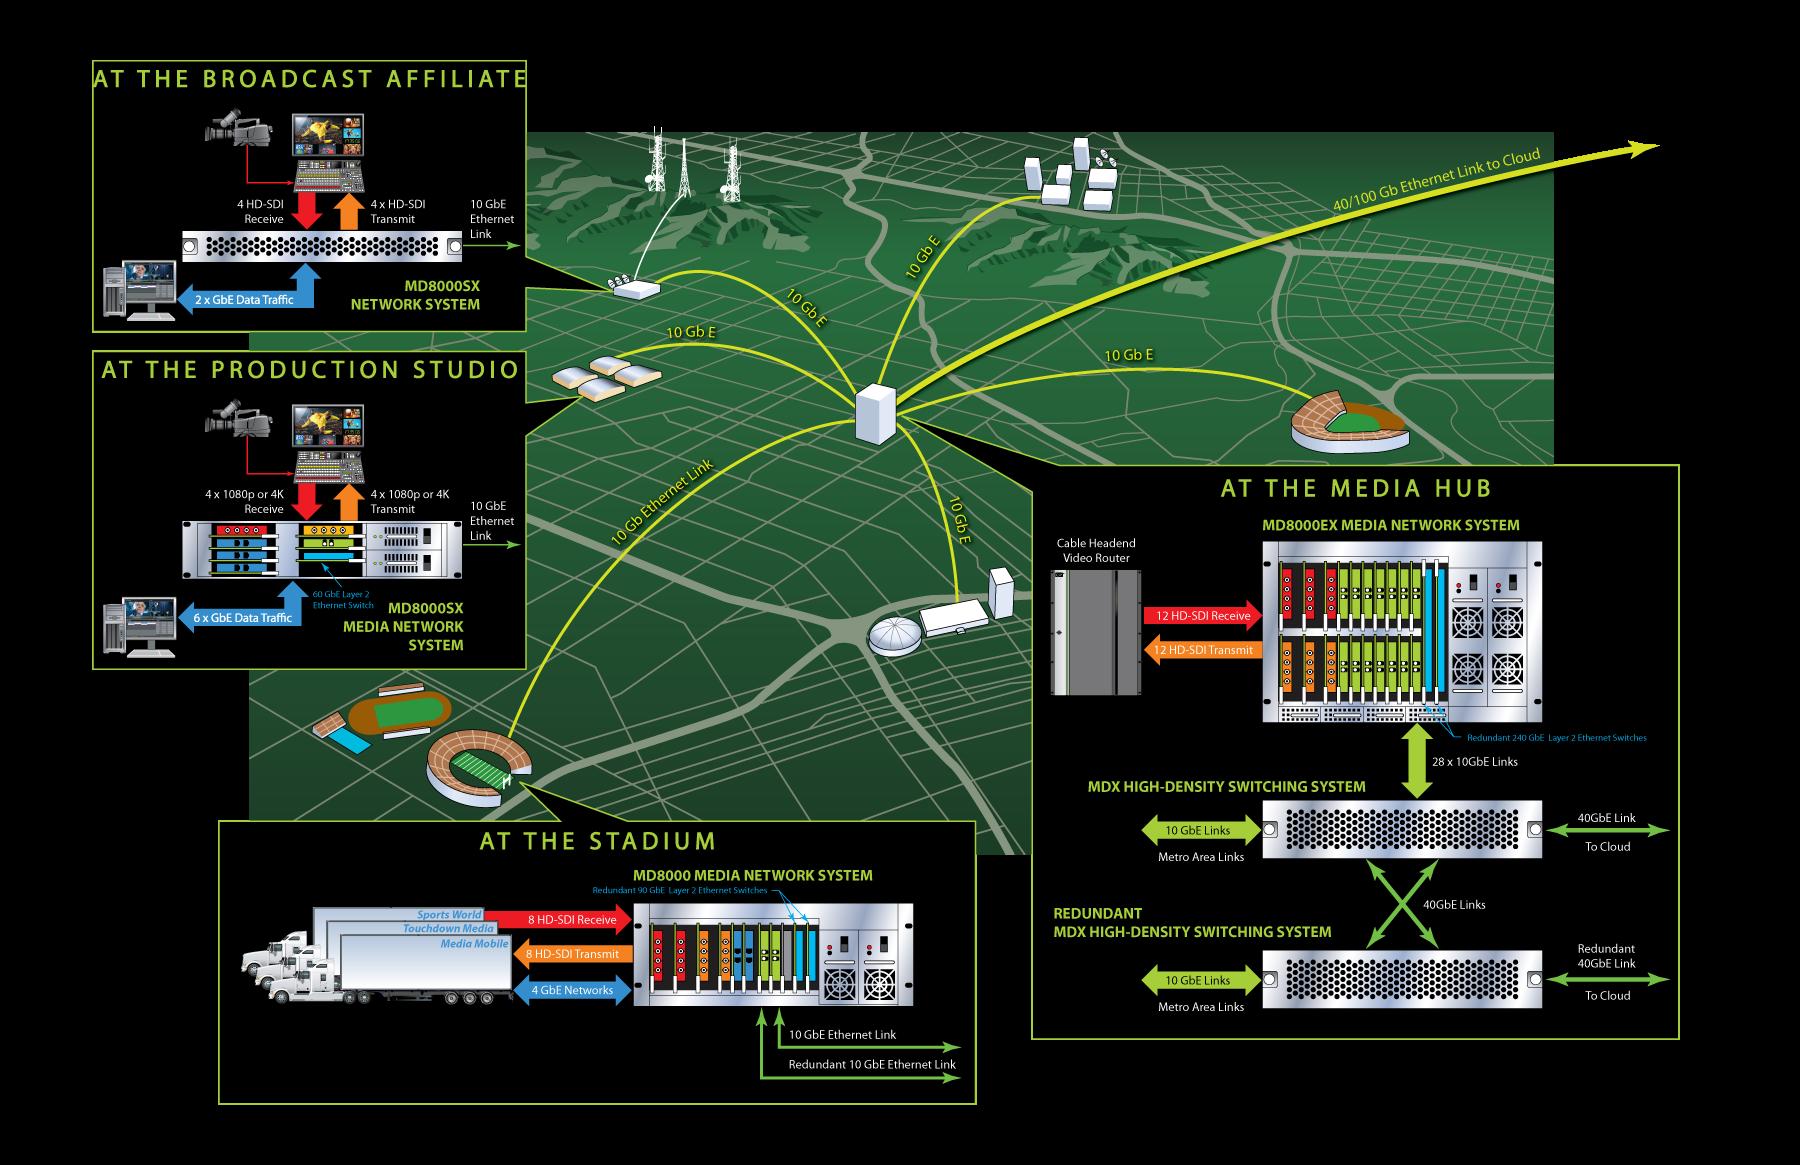 Media-Links_Website-Applications-Metropolitan-Distribution-Network-